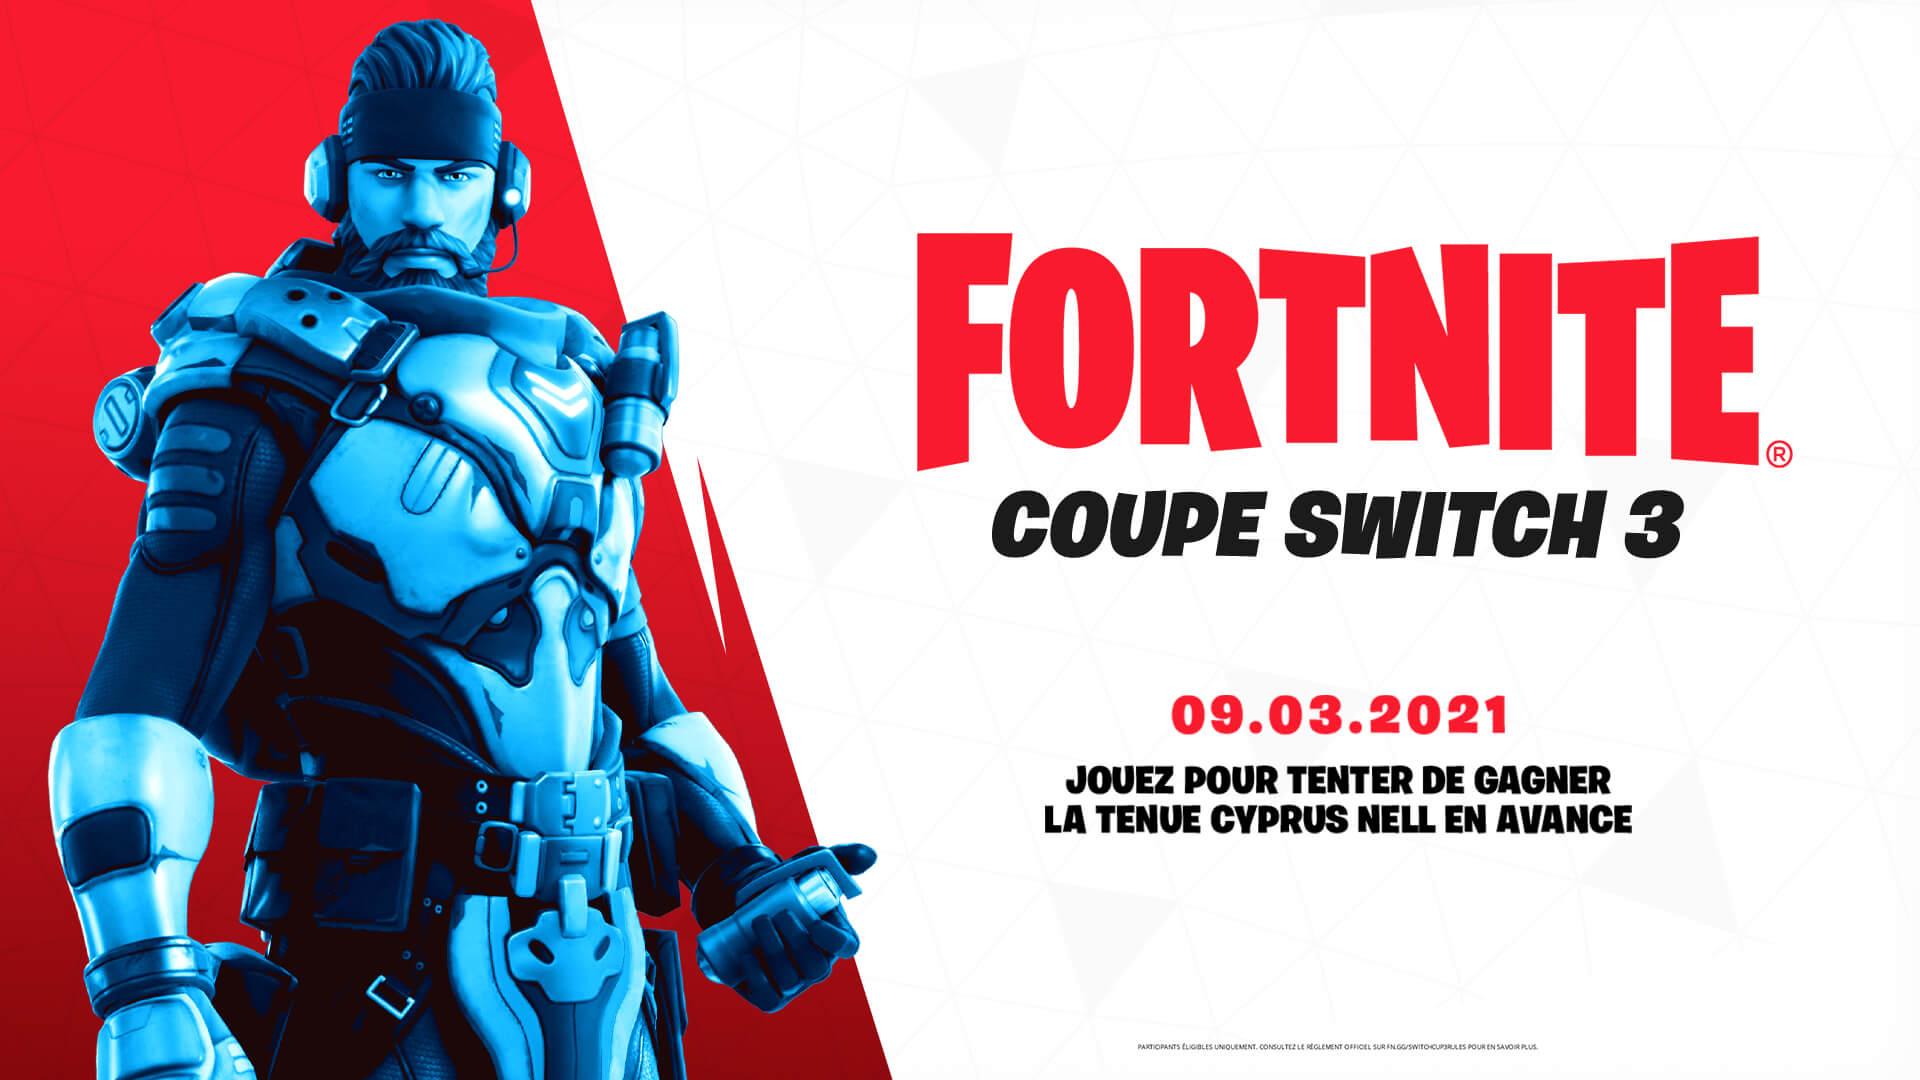 FR 15BR Comp SwitchCup3 Social